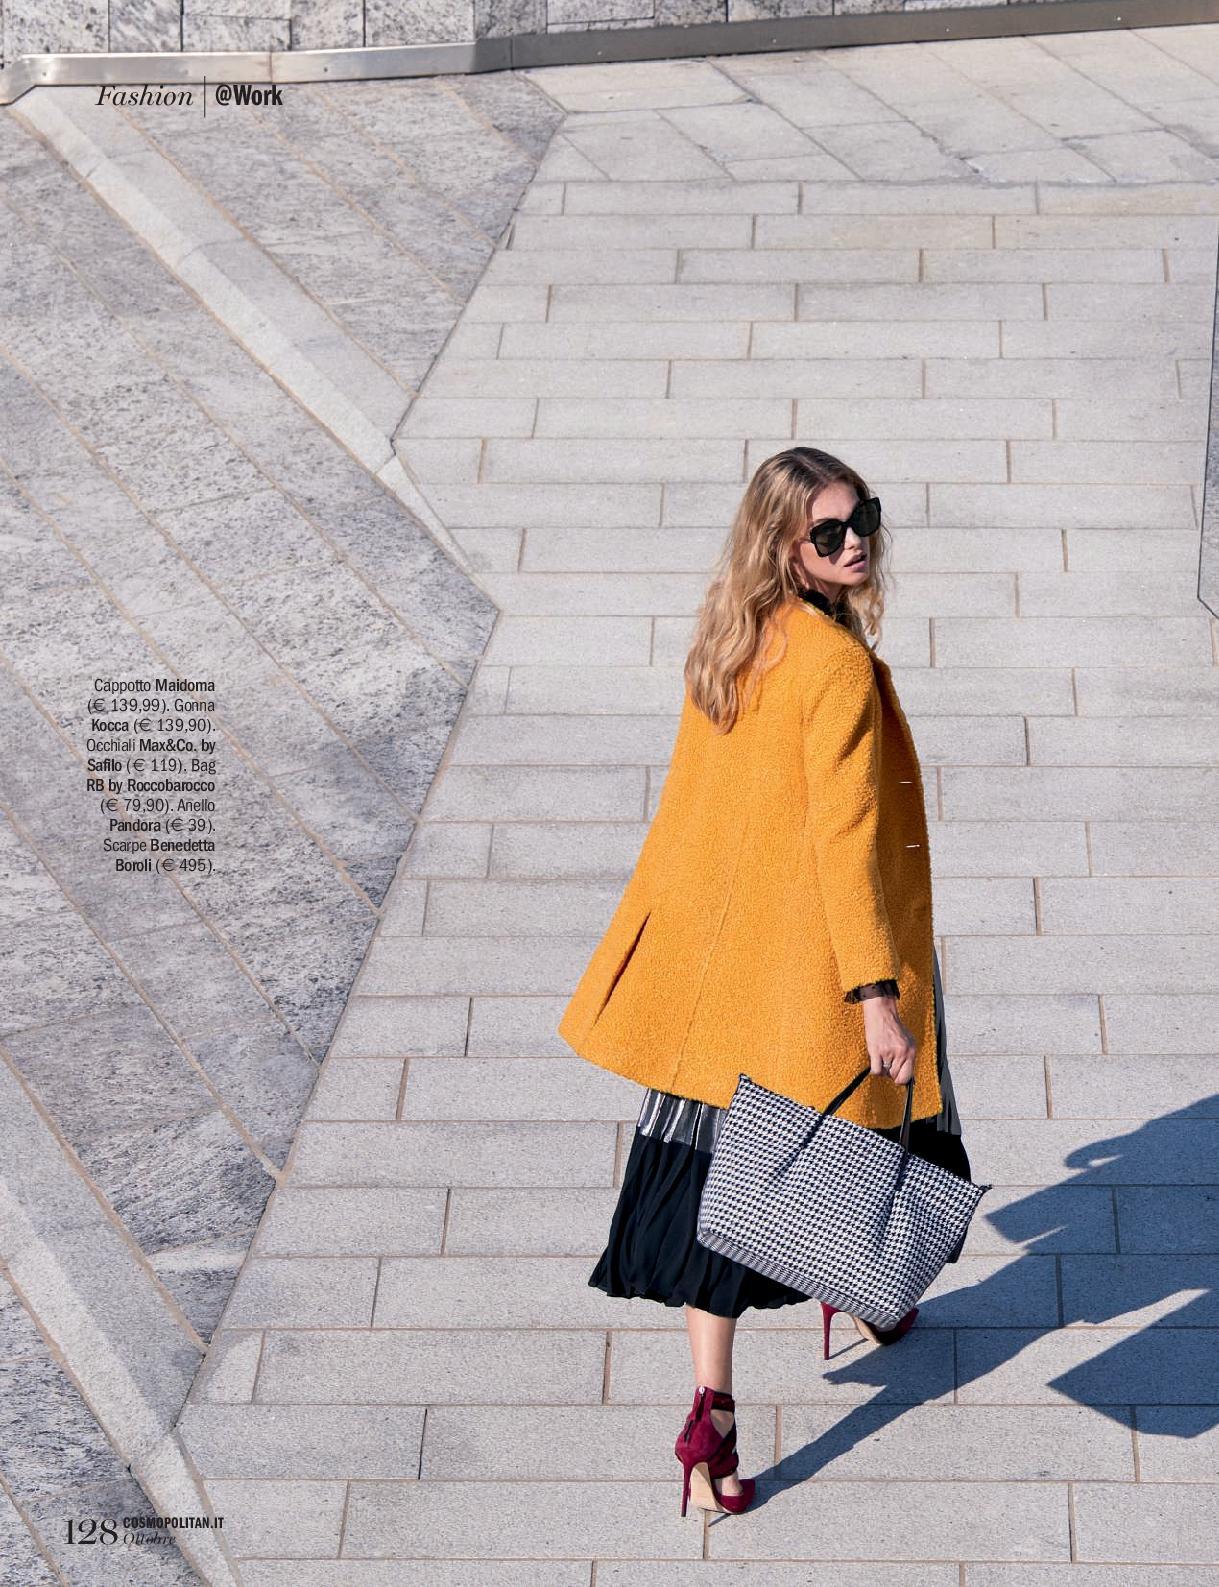 Cosmopolitan, October Issue